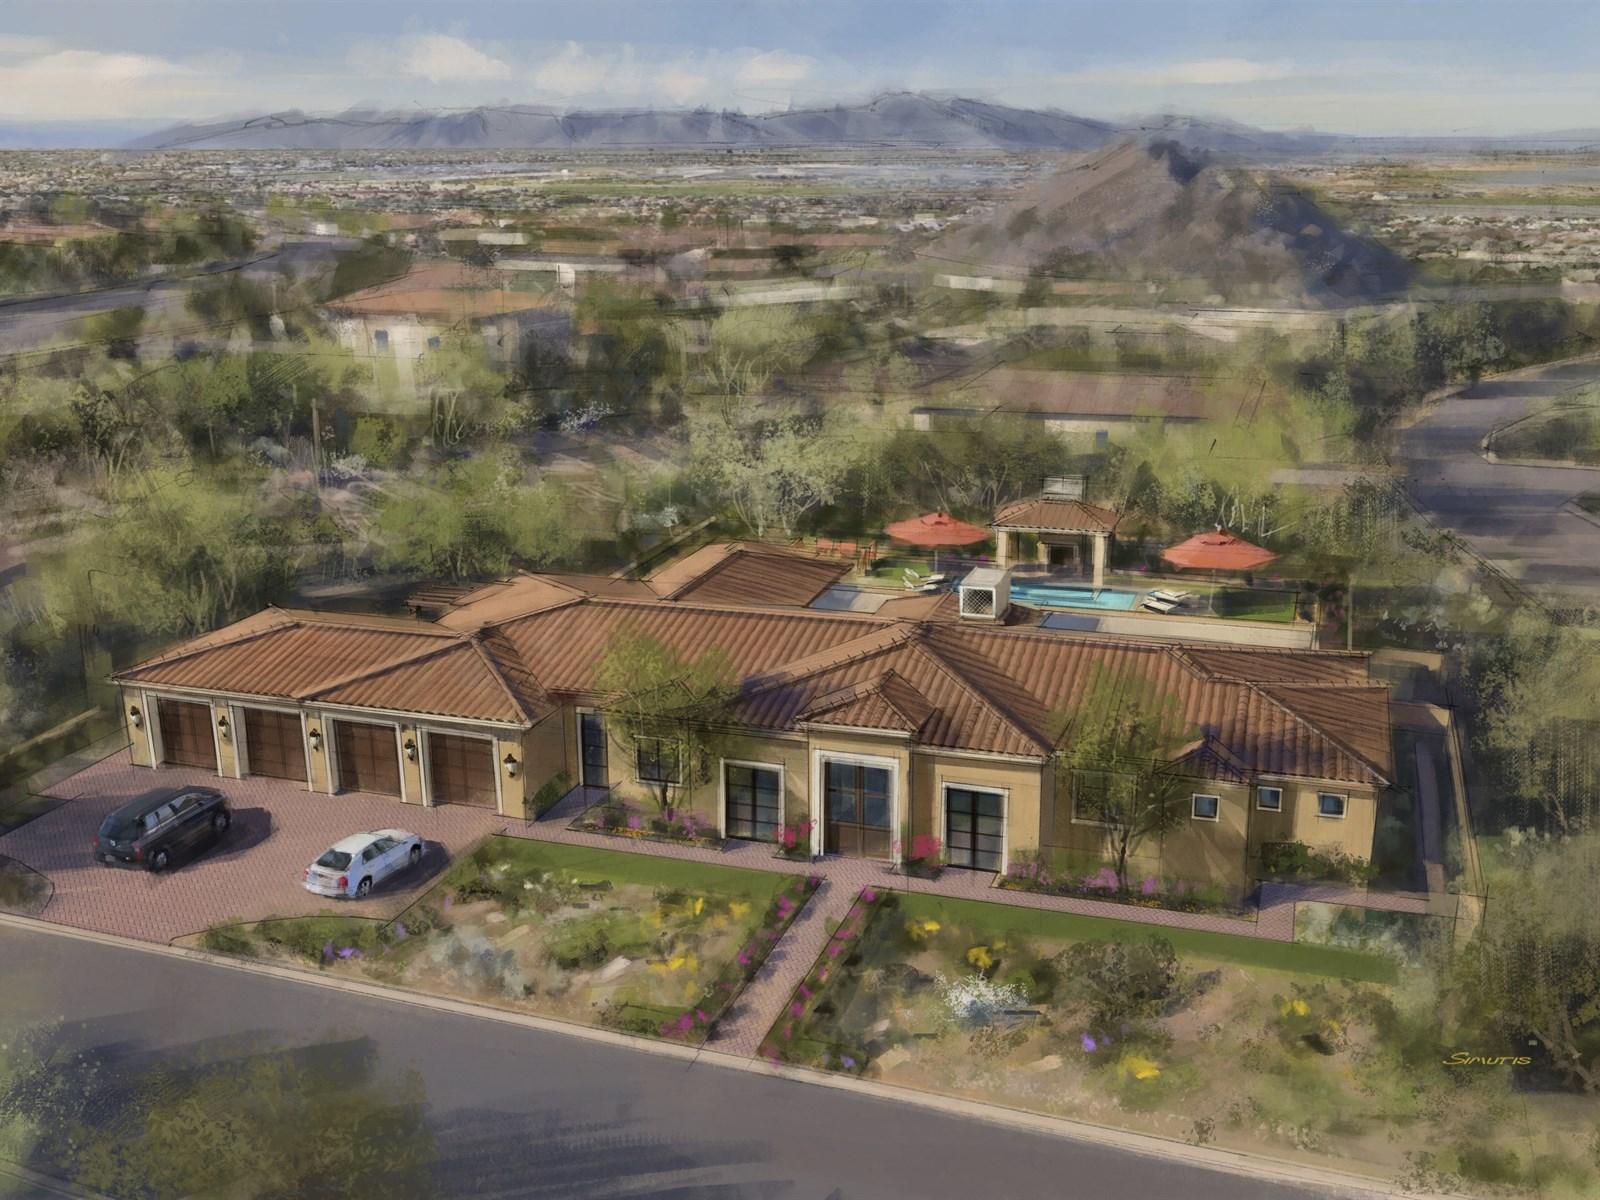 獨棟家庭住宅 為 出售 在 New Luxury Spanish Mediterranean Villa. 7241 E Summit Trail ST Mesa, 亞利桑那州 85207 美國